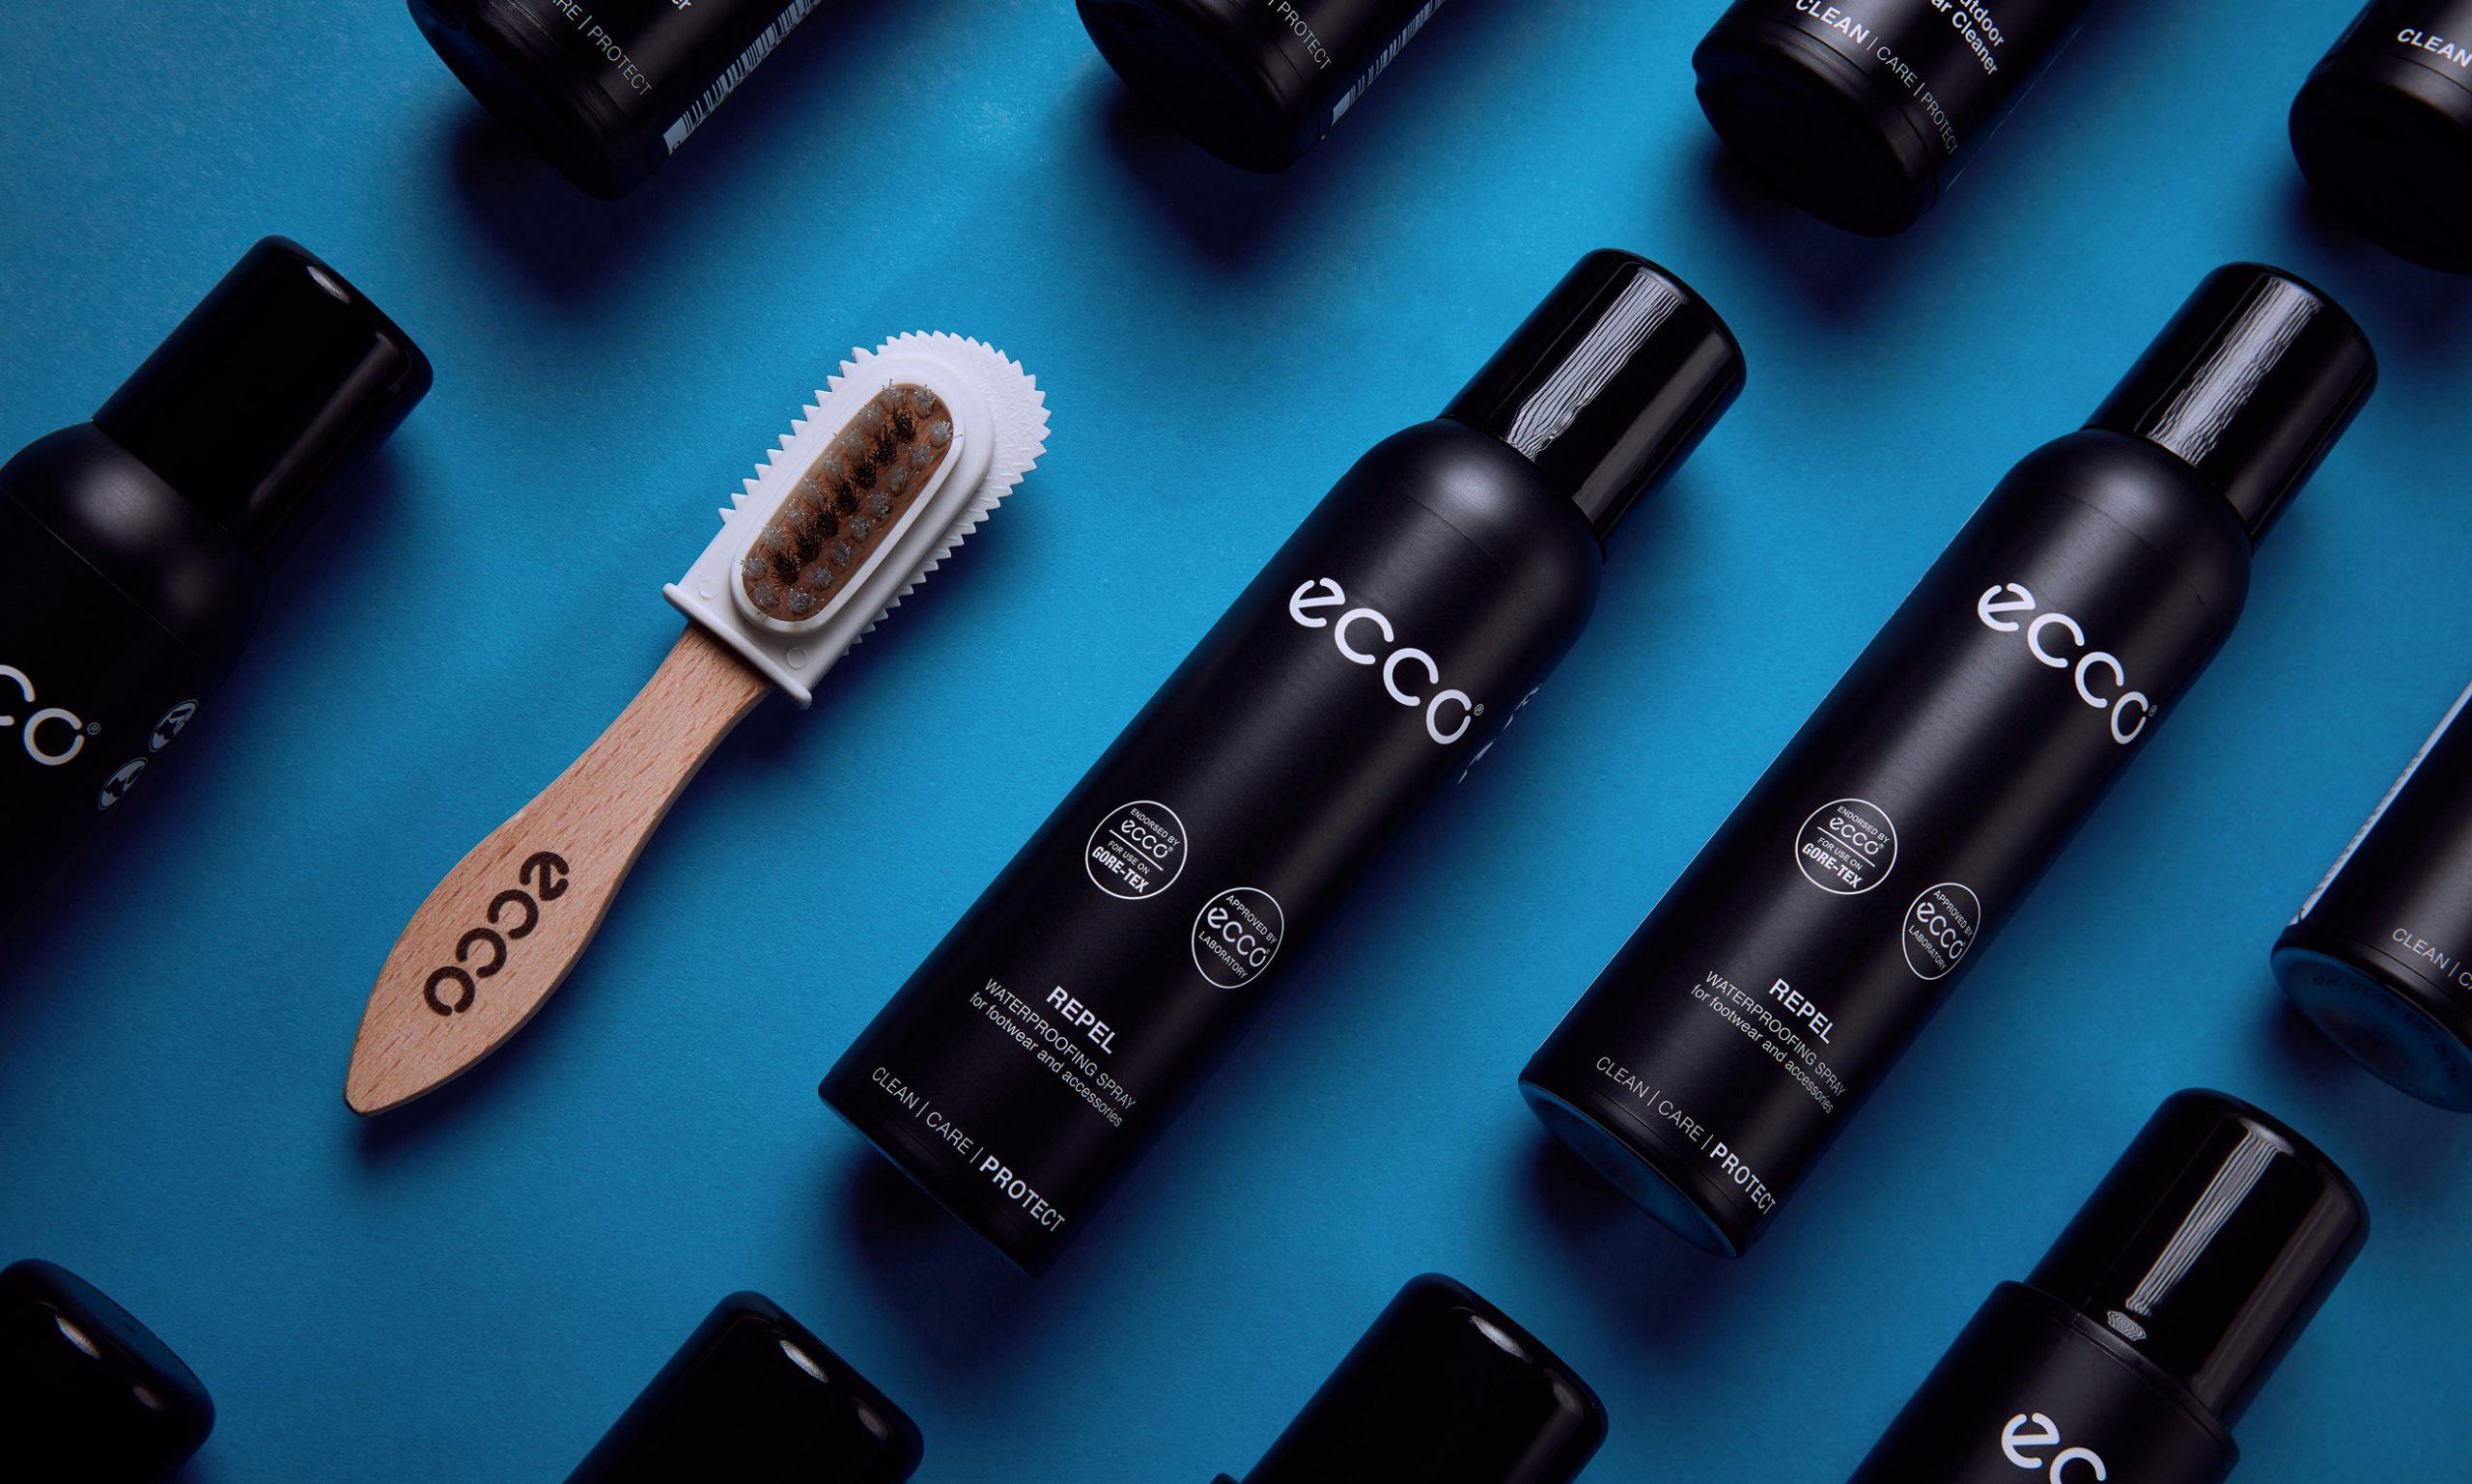 ECCO 推出皮革护理系列